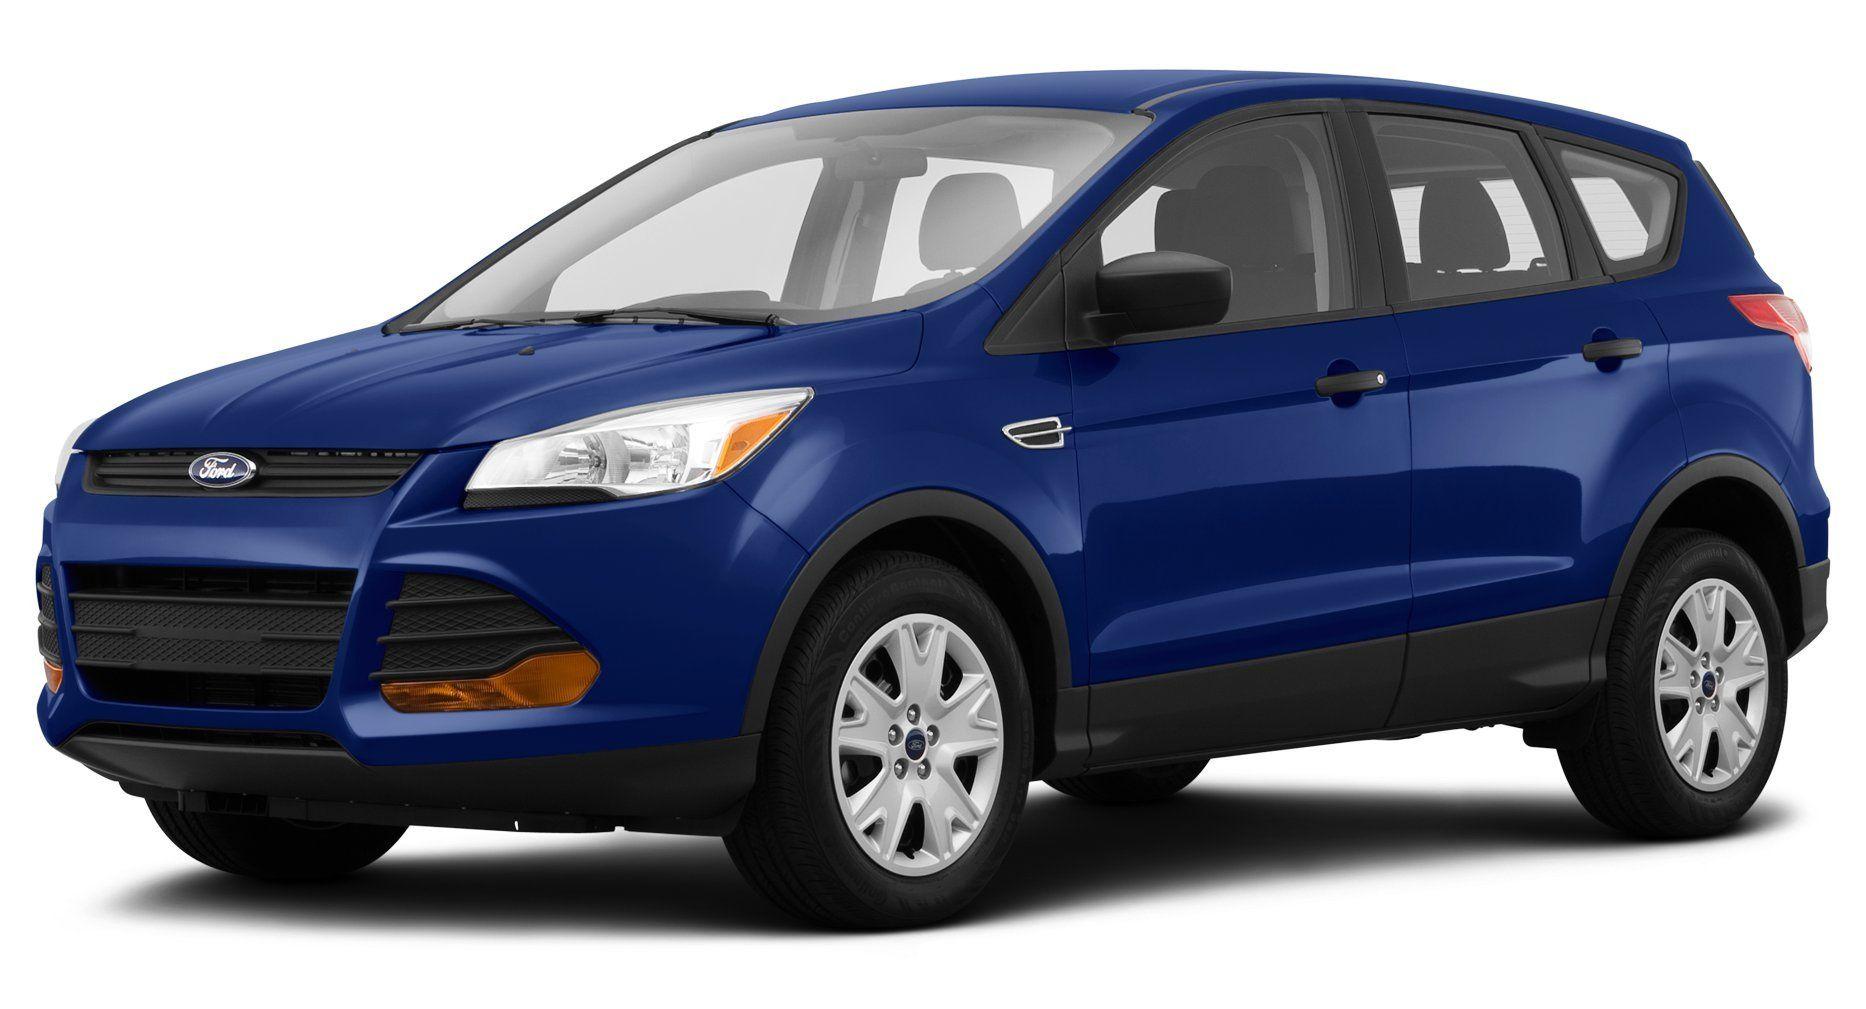 Ford Escape Ecoboost >> Elegant Ford Escape 2 0 Ecoboost Towing